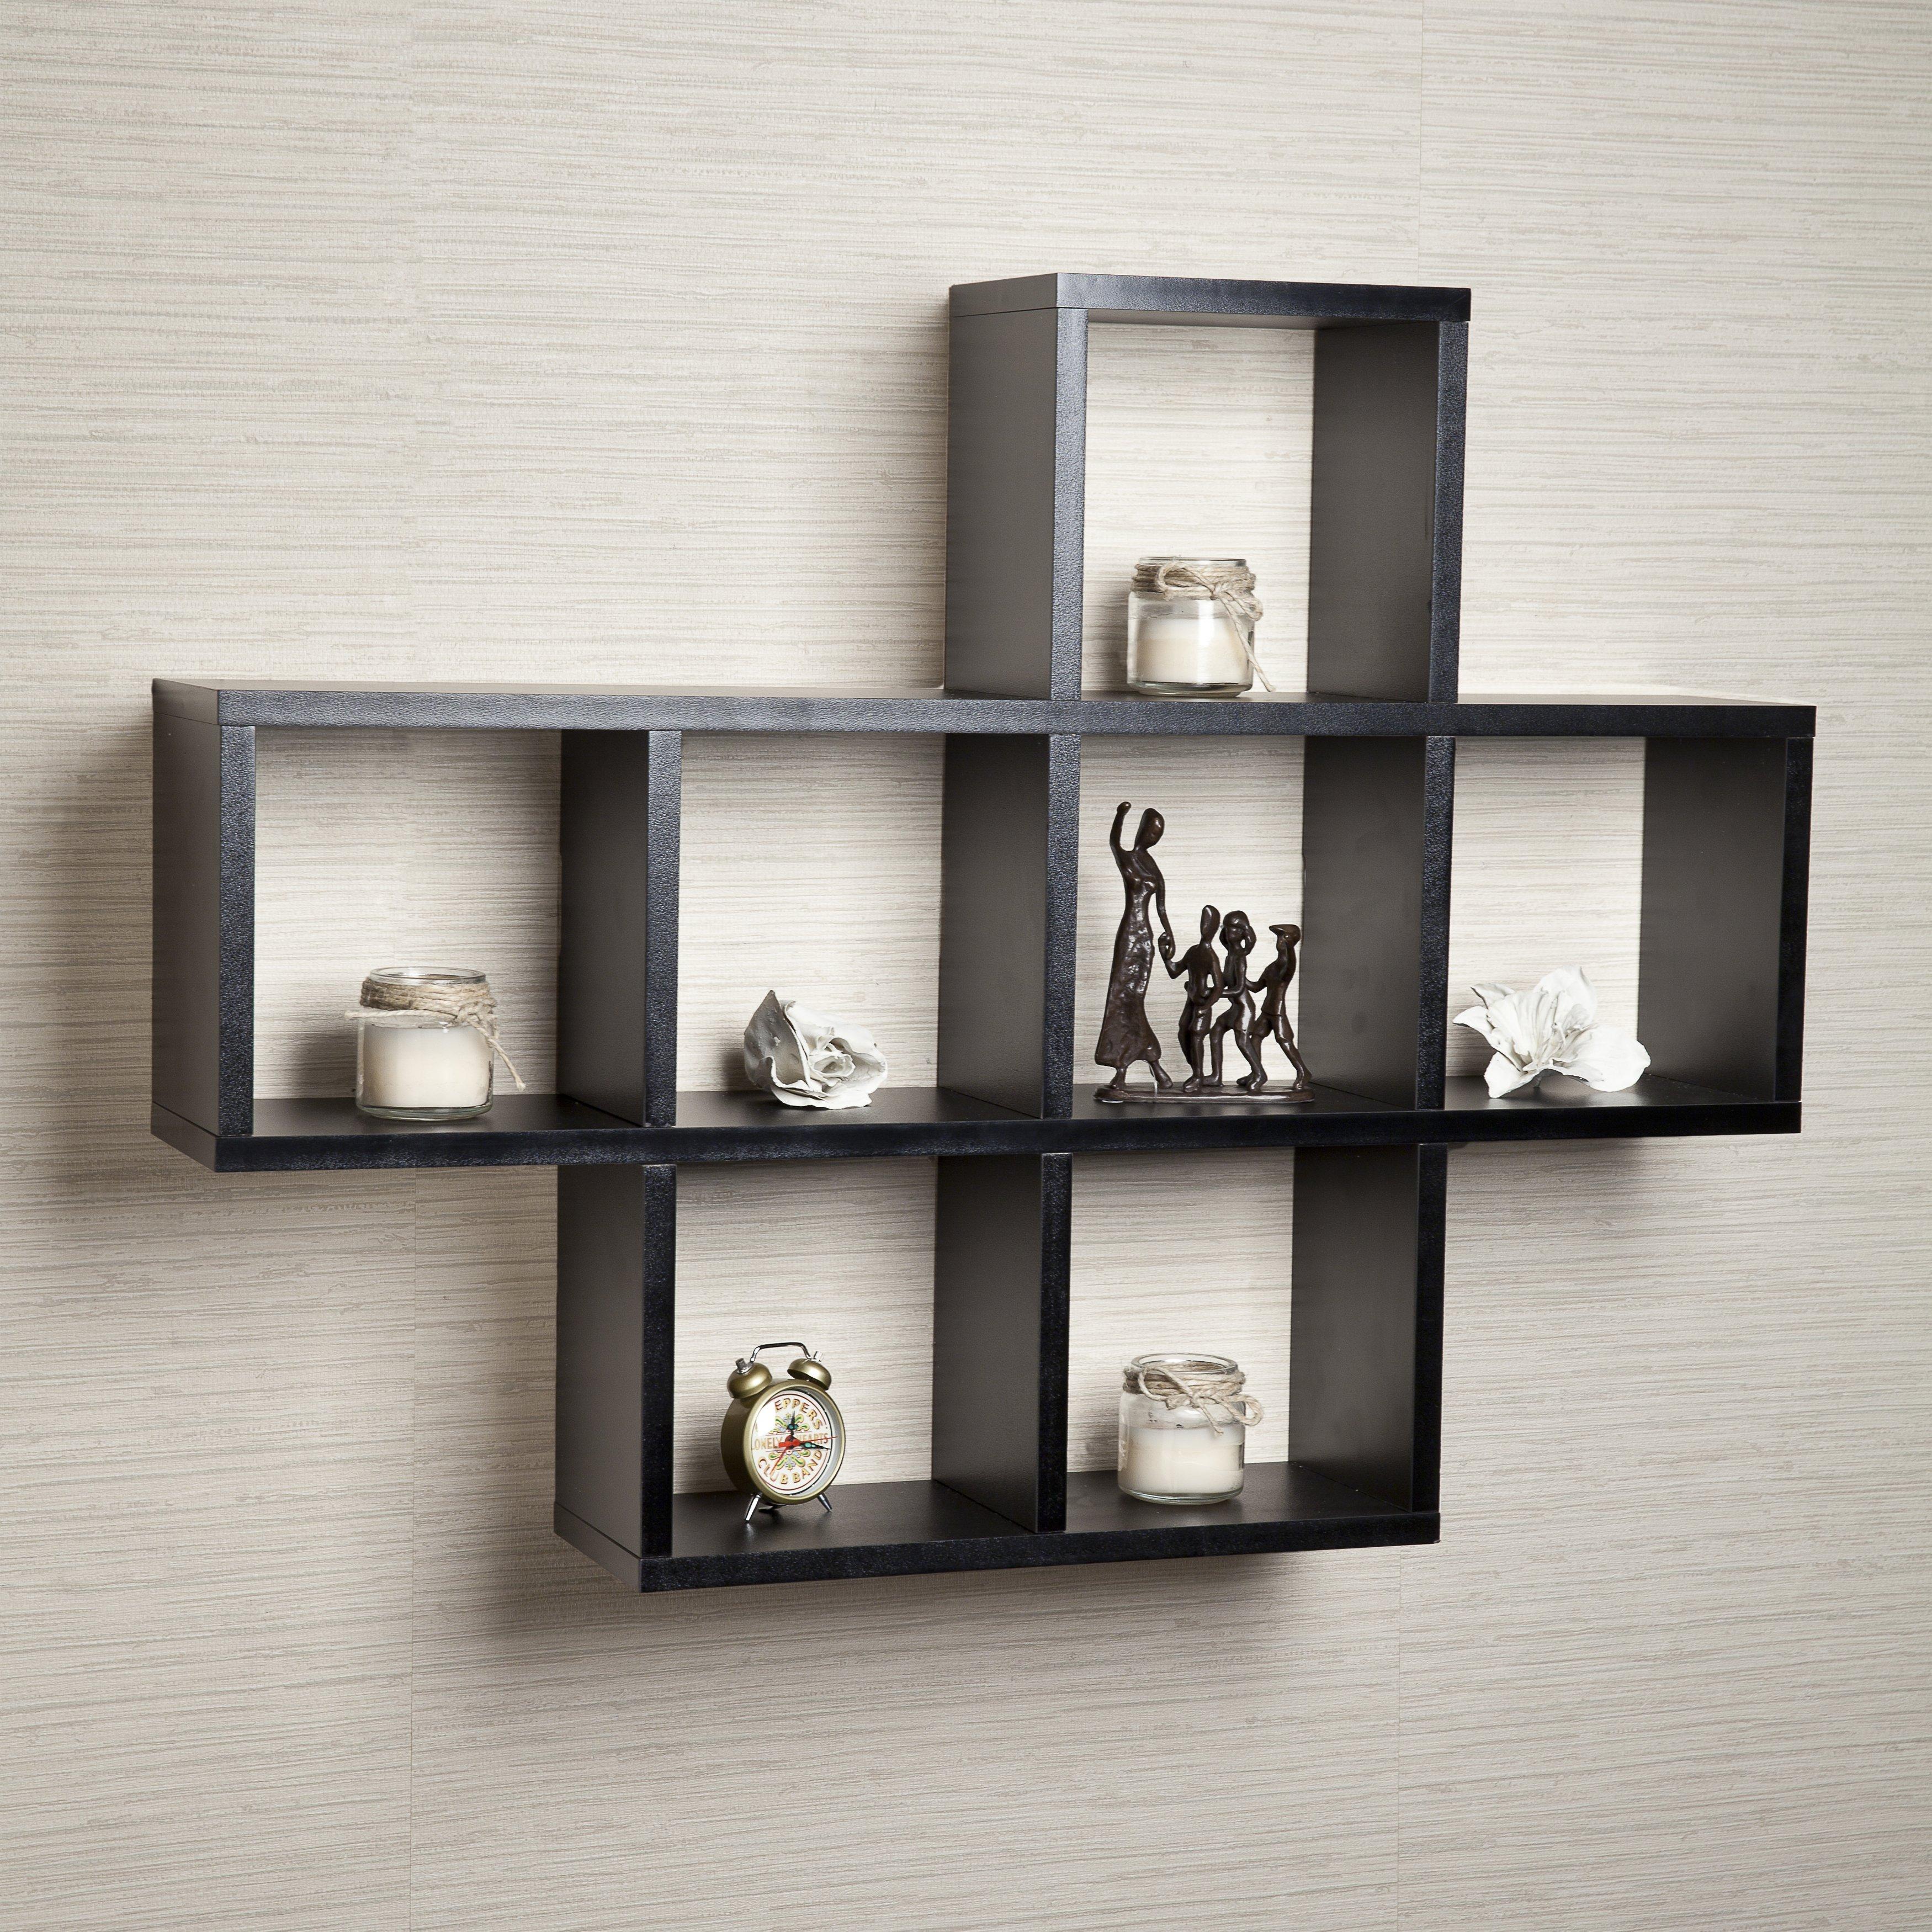 Stunning Wall u0026 Display Shelves Youu0027ll Love | Wayfair wall shelving units